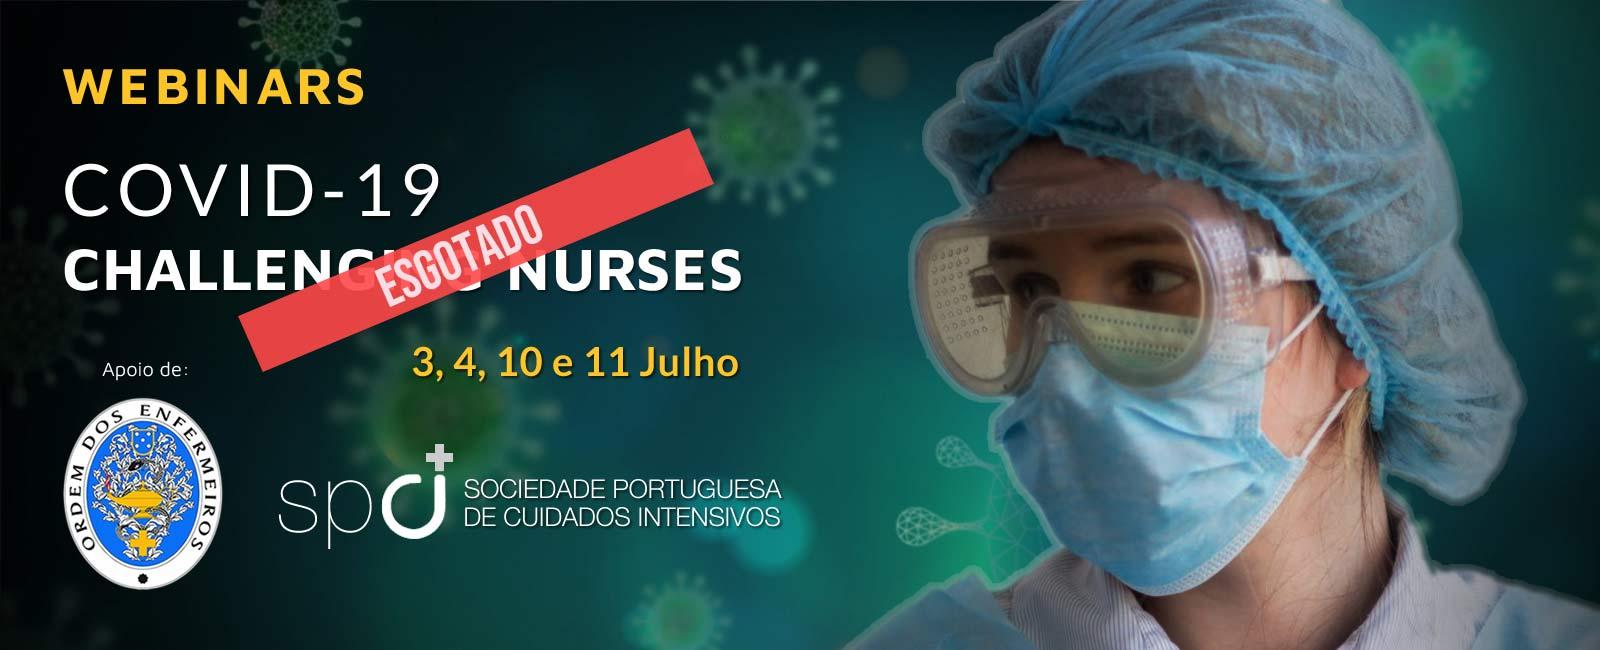 Webinar Covid-19 - Challenging Nurses